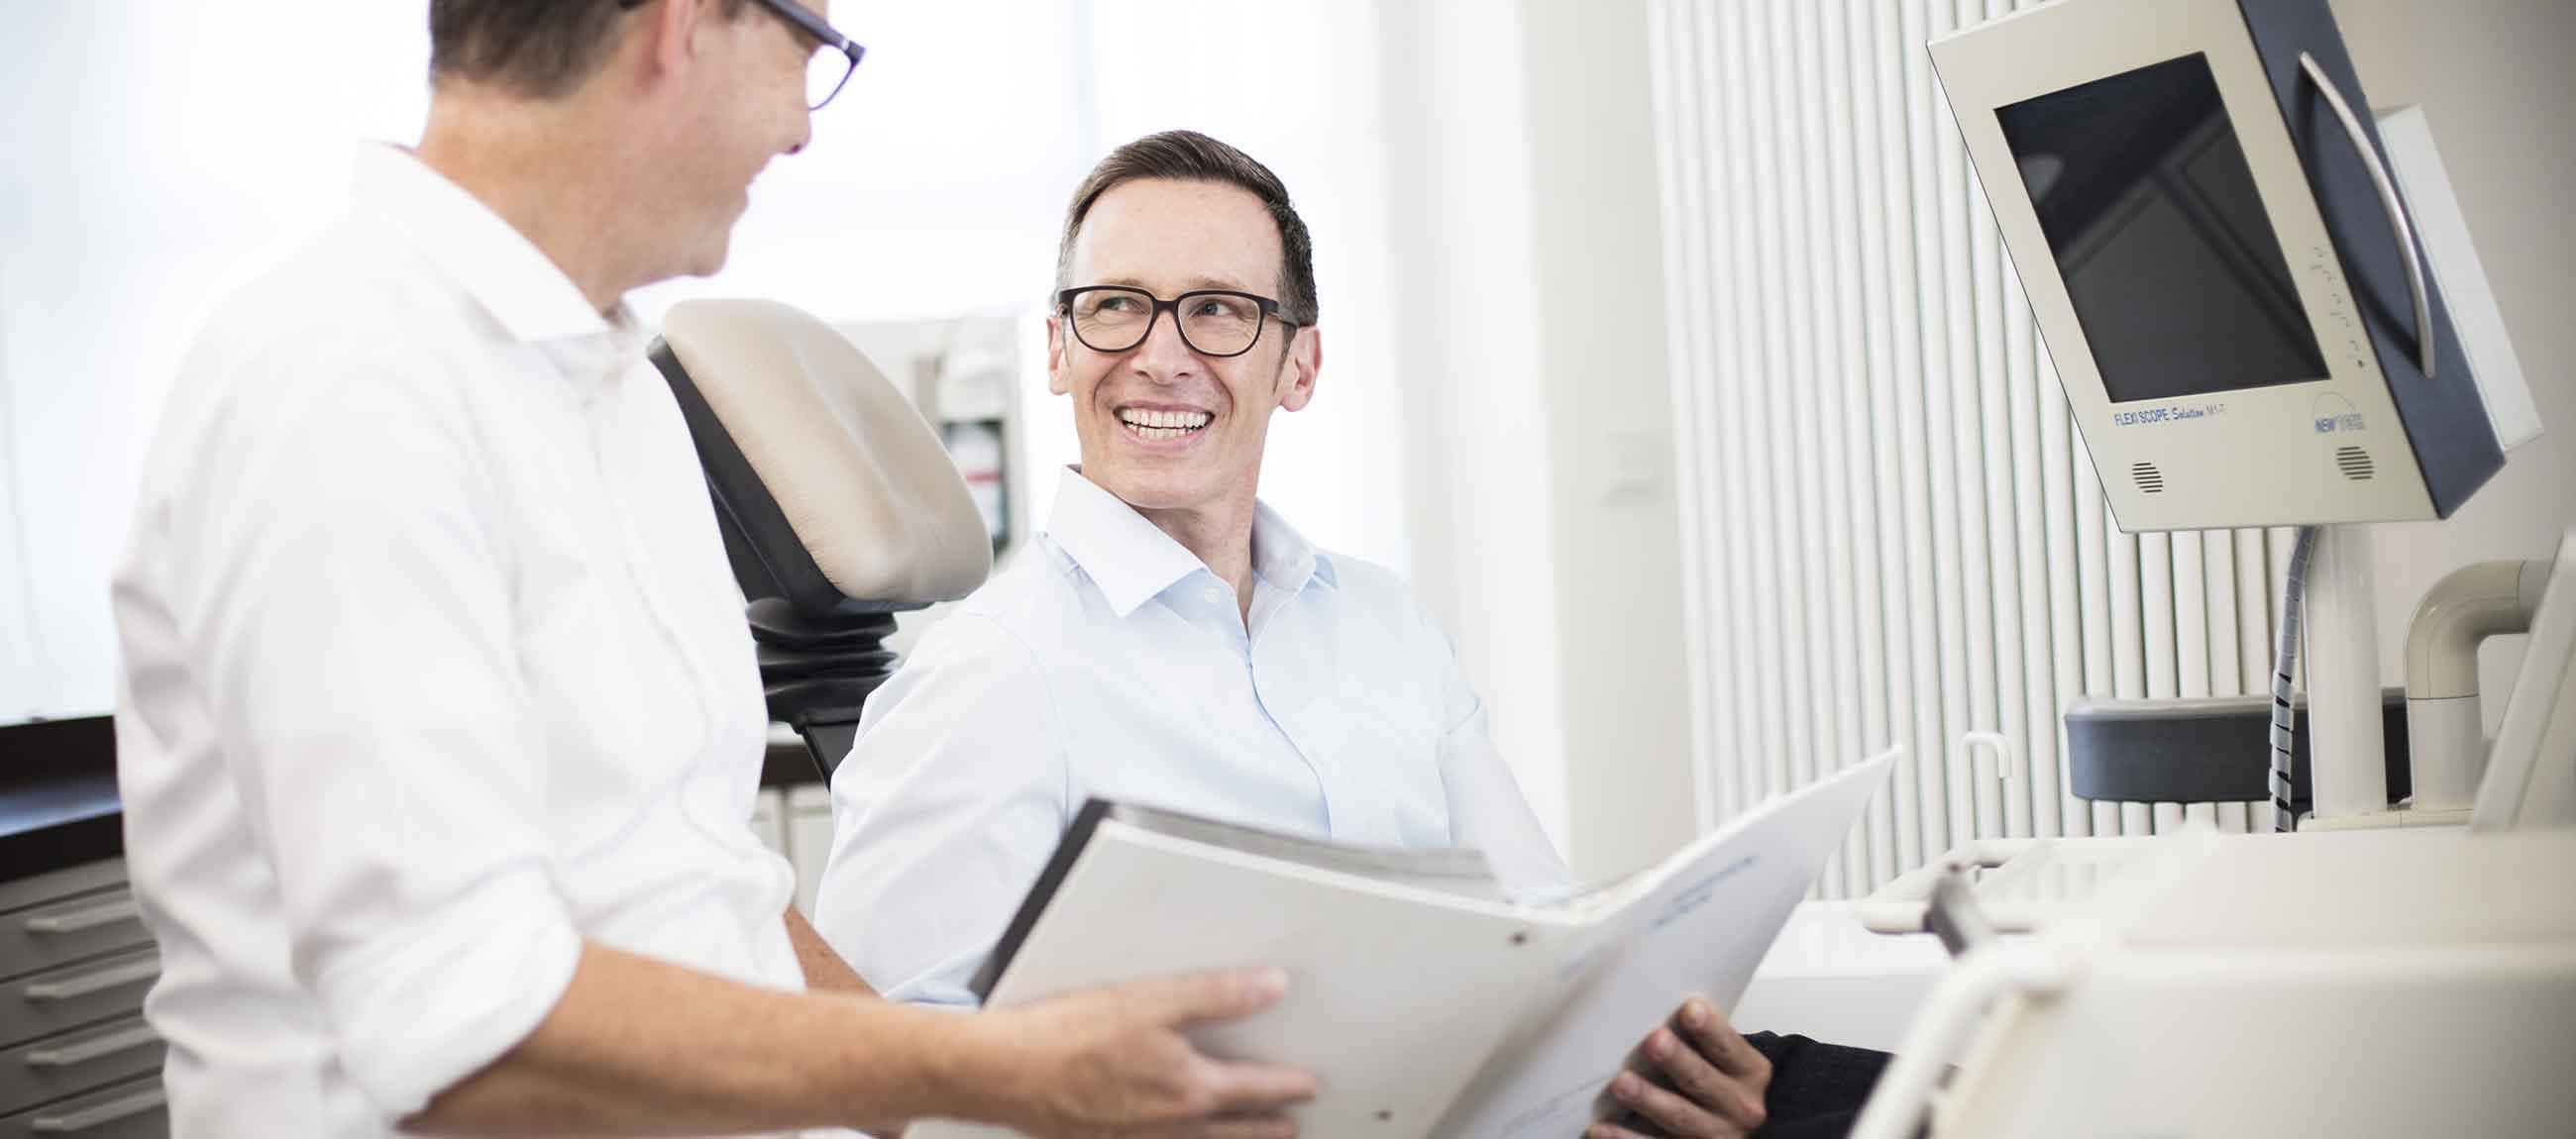 Dr. Michael Woehrle Zahnmedizin | Impressionen